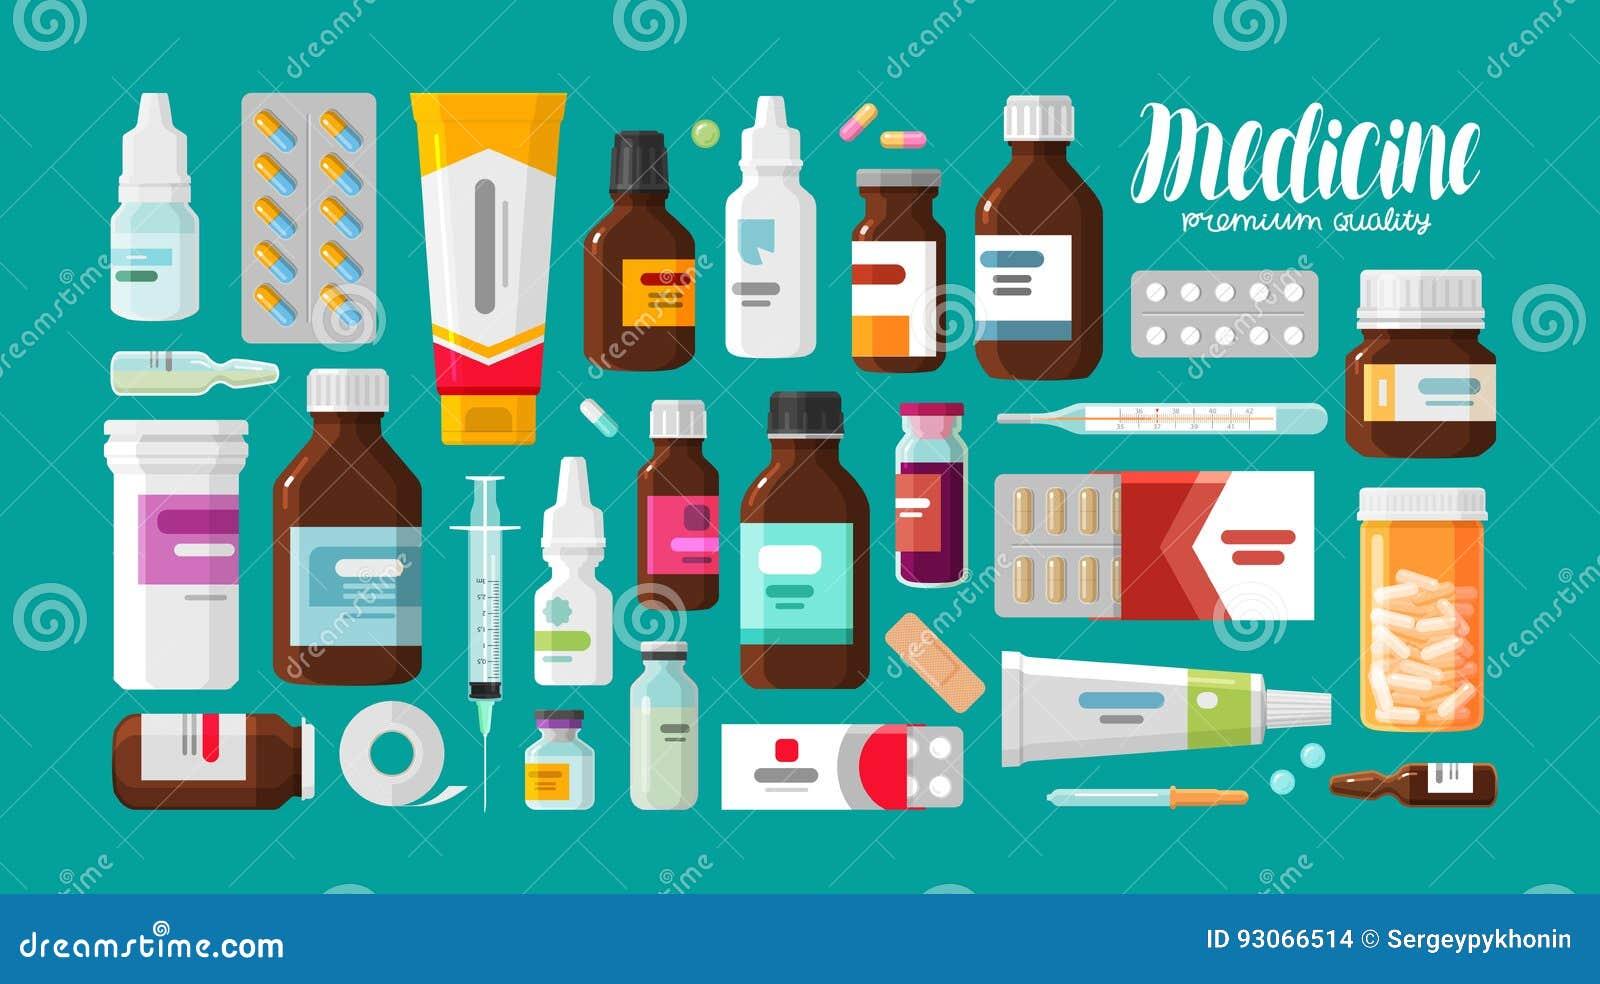 Medicine, pharmacy, hospital set of drugs with labels. Medication, pharmaceutics concept. Vector illustration